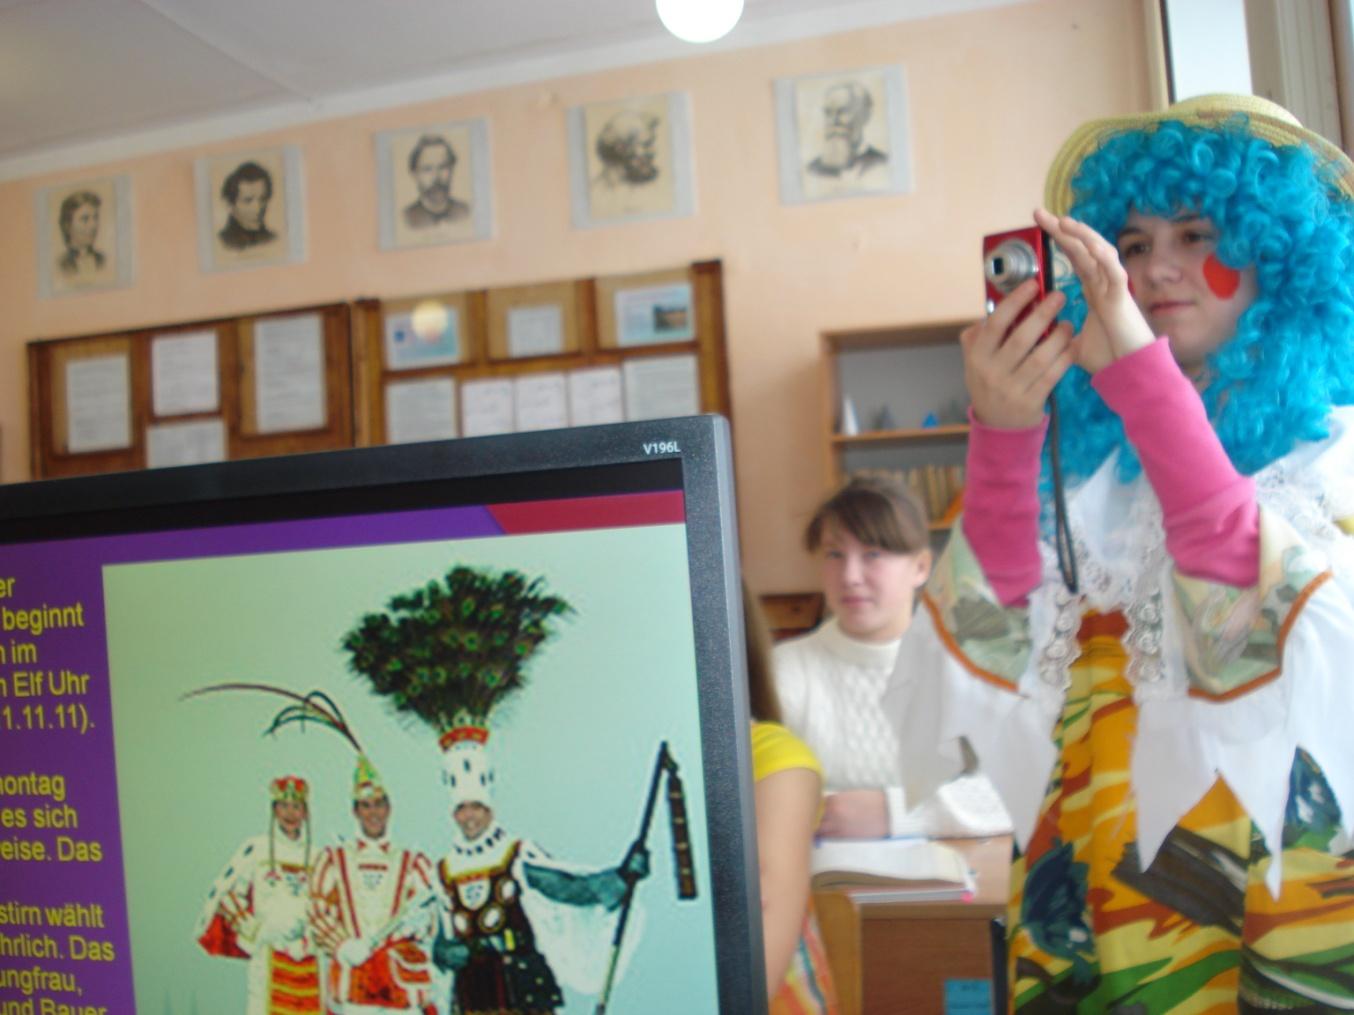 C:\Documents and Settings\Немецкий язык\Рабочий стол\карнавал 2015\101MSDCF\DSC07625.JPG